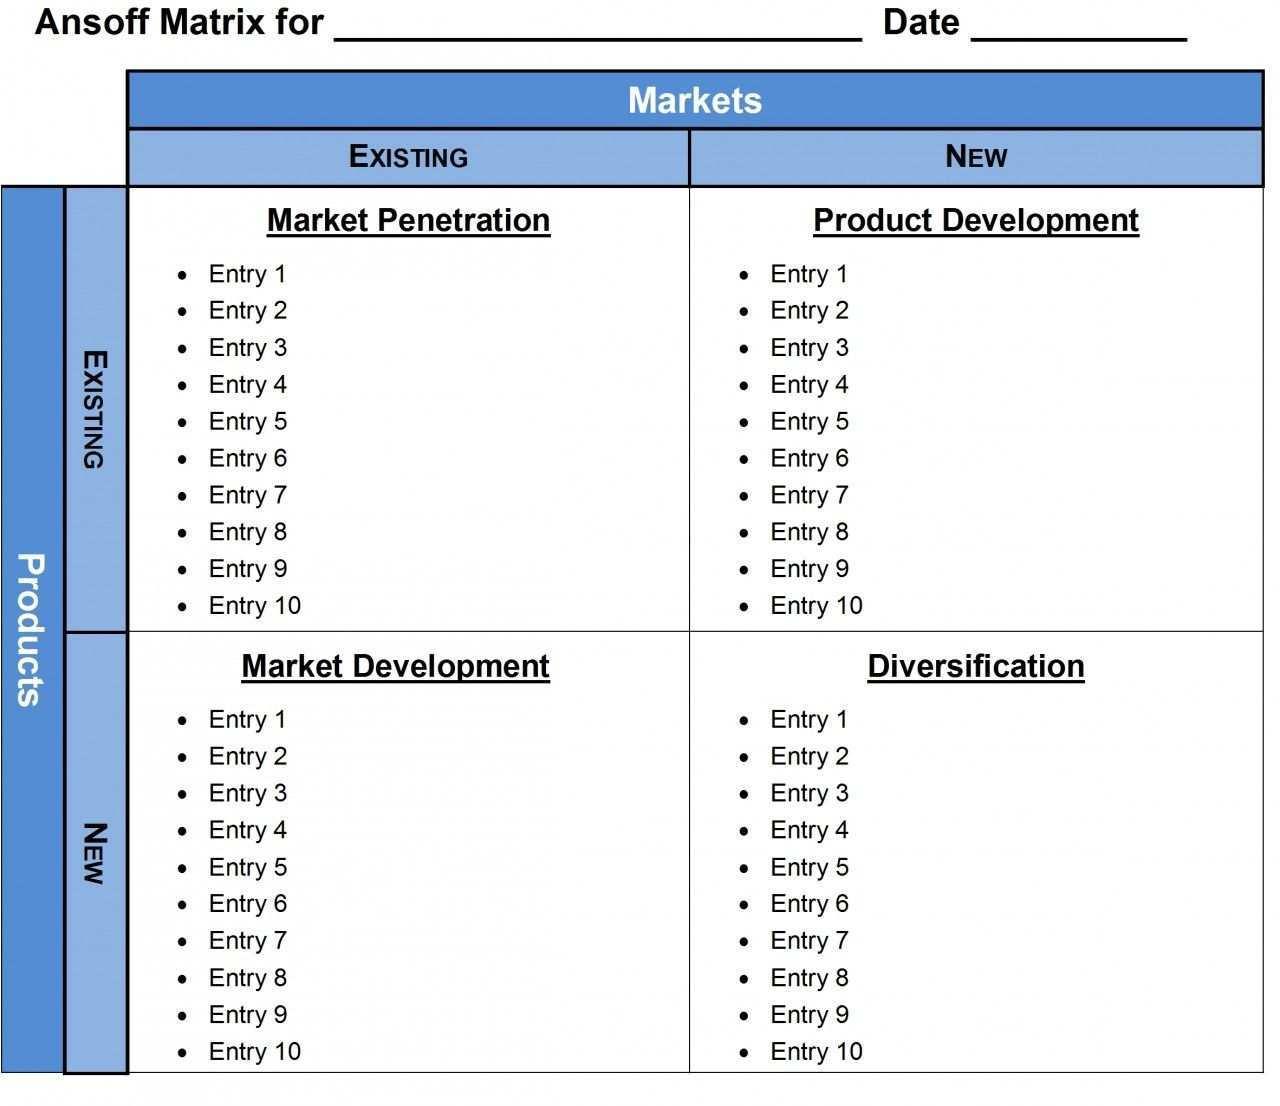 Ansoff Matrix Ms Word Template Microsoft Word Invoice Template Label Templates Word Template